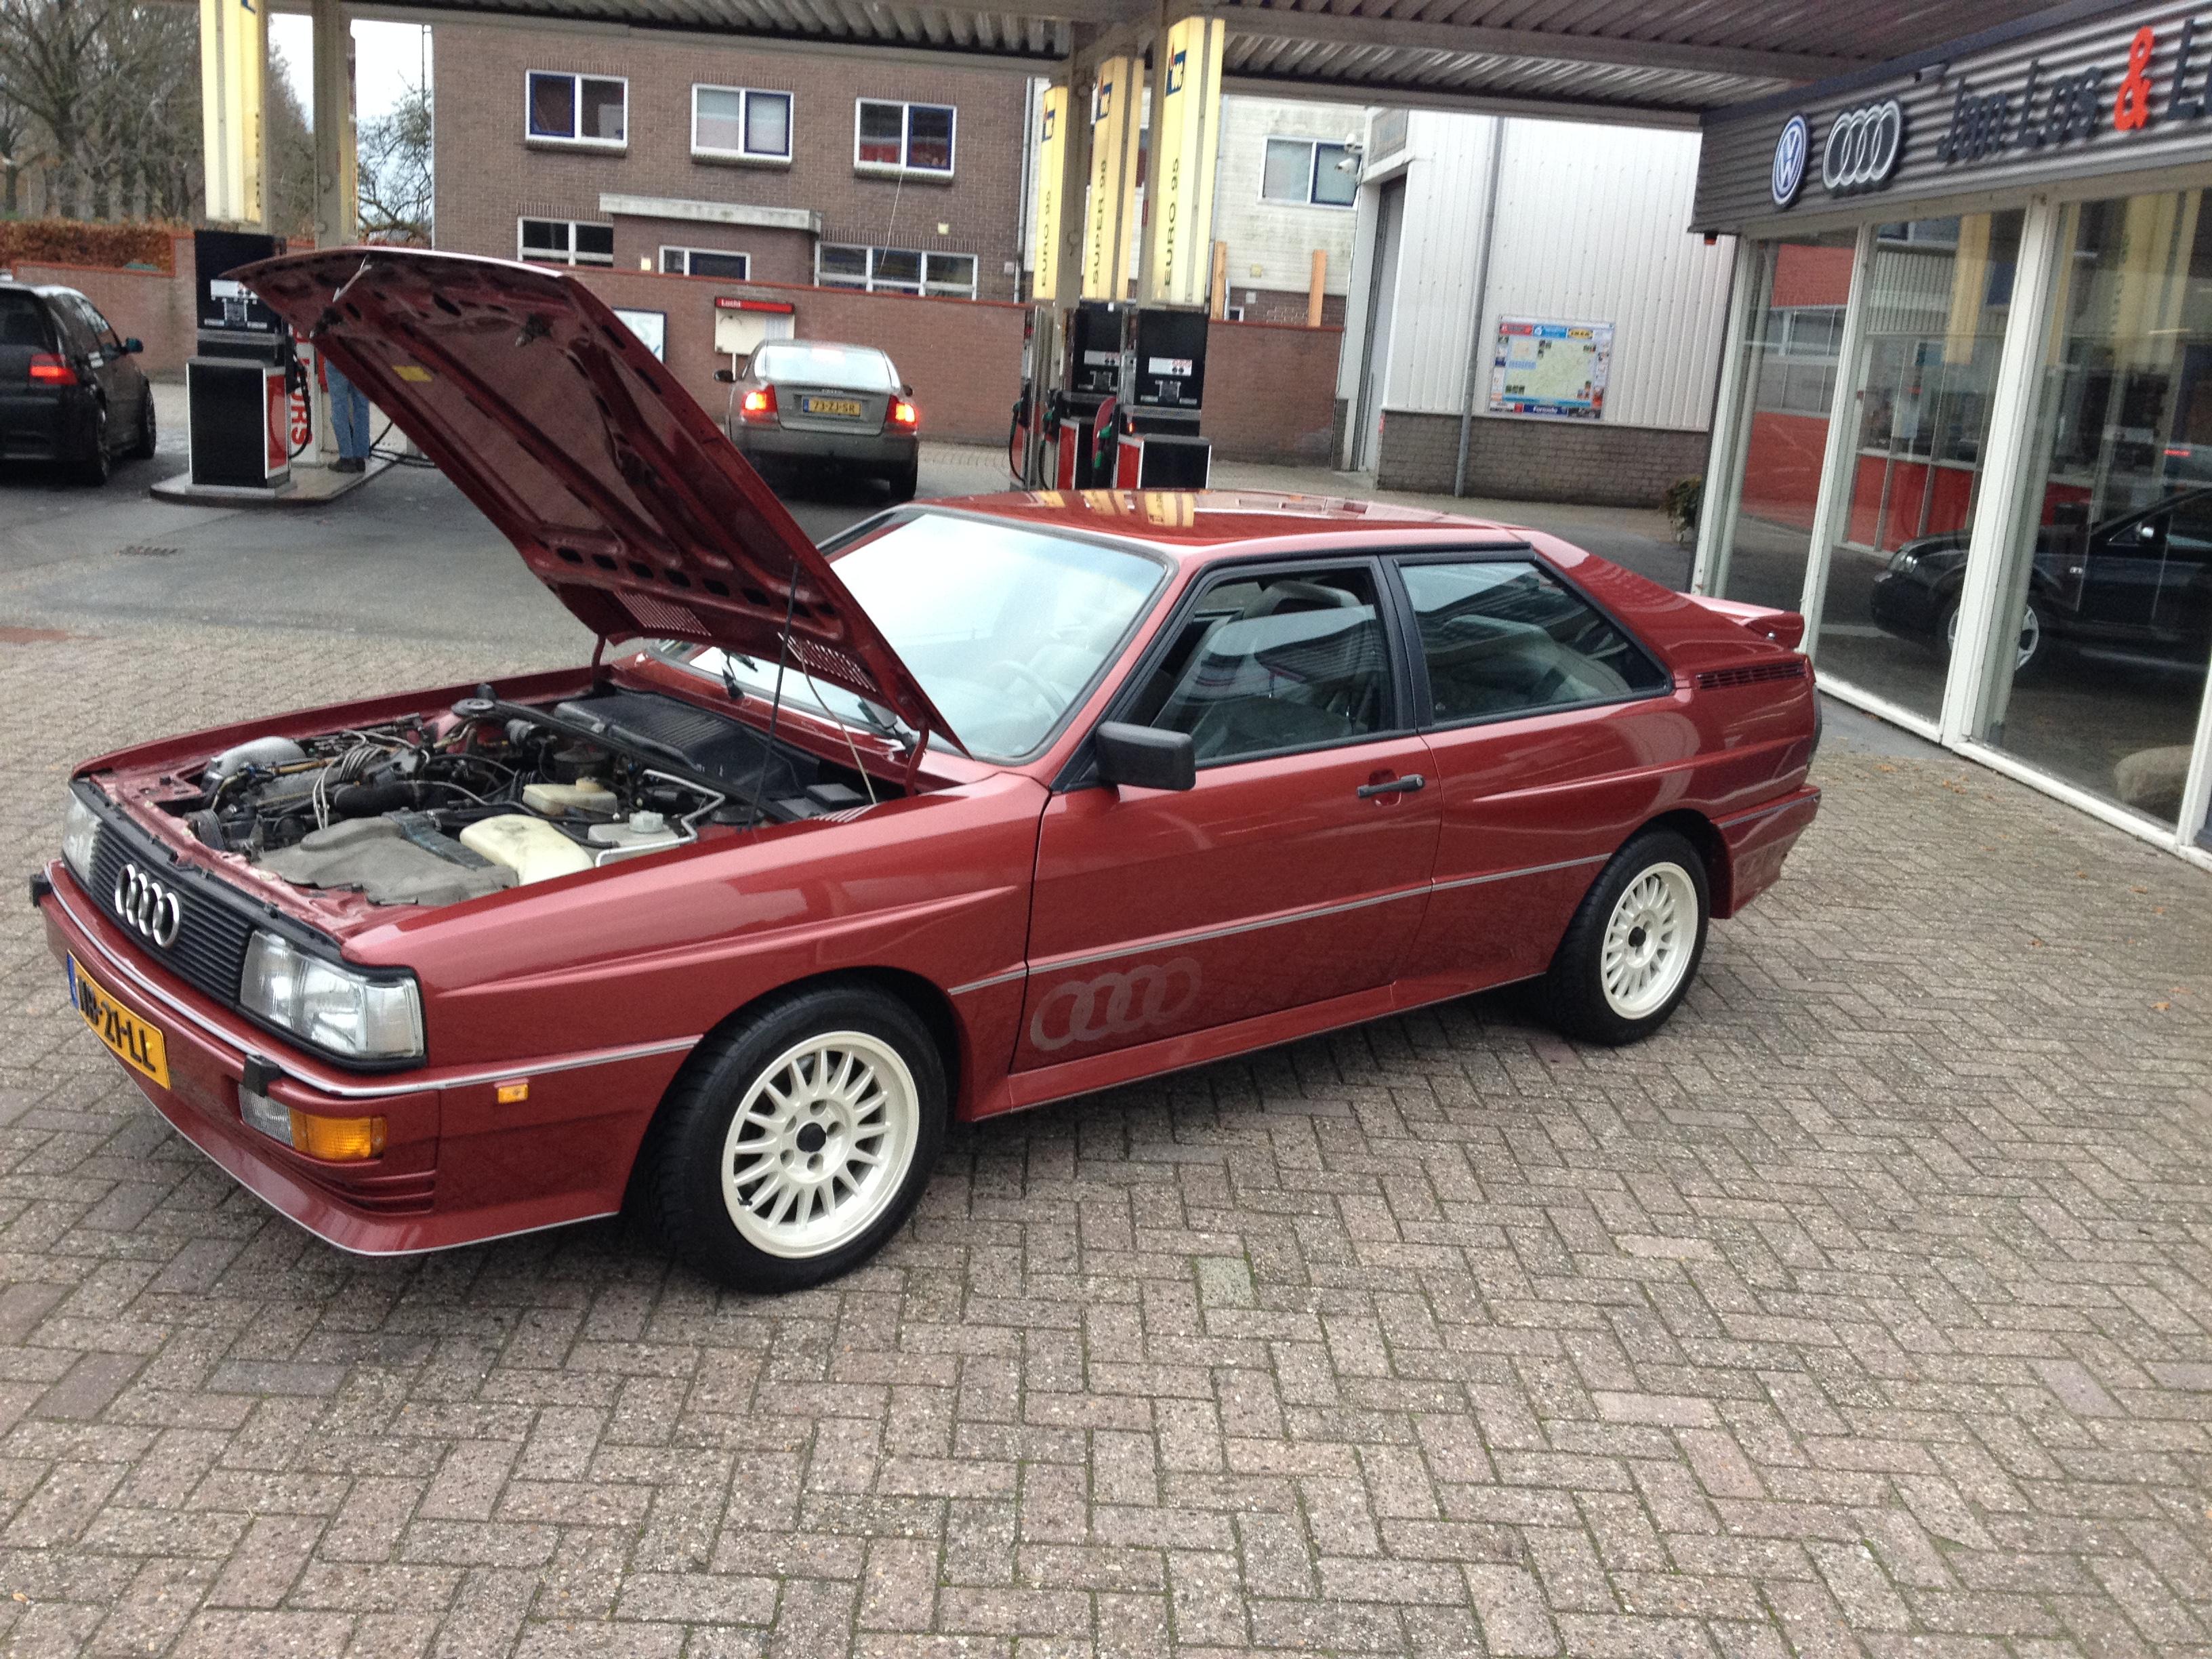 Audi Urquattro 2 1 10v Turbo Review Jmspeedshop